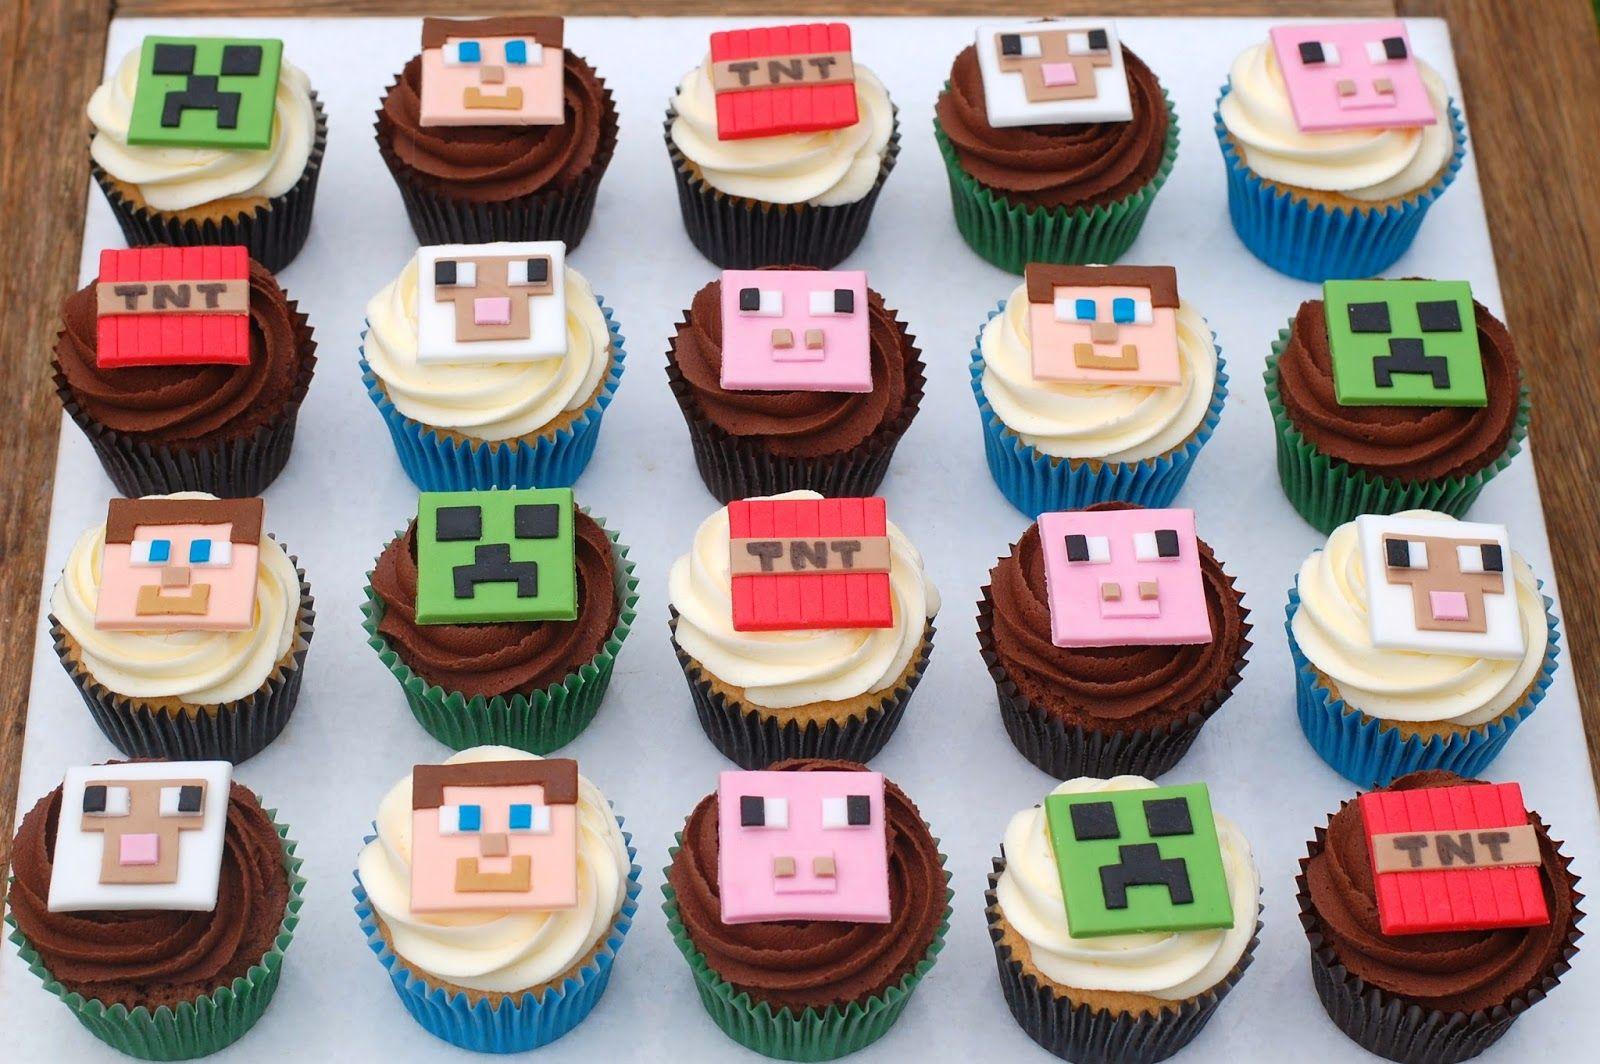 Easy Minecraft Cake Steve Cupcakes Minecraft Cakes For